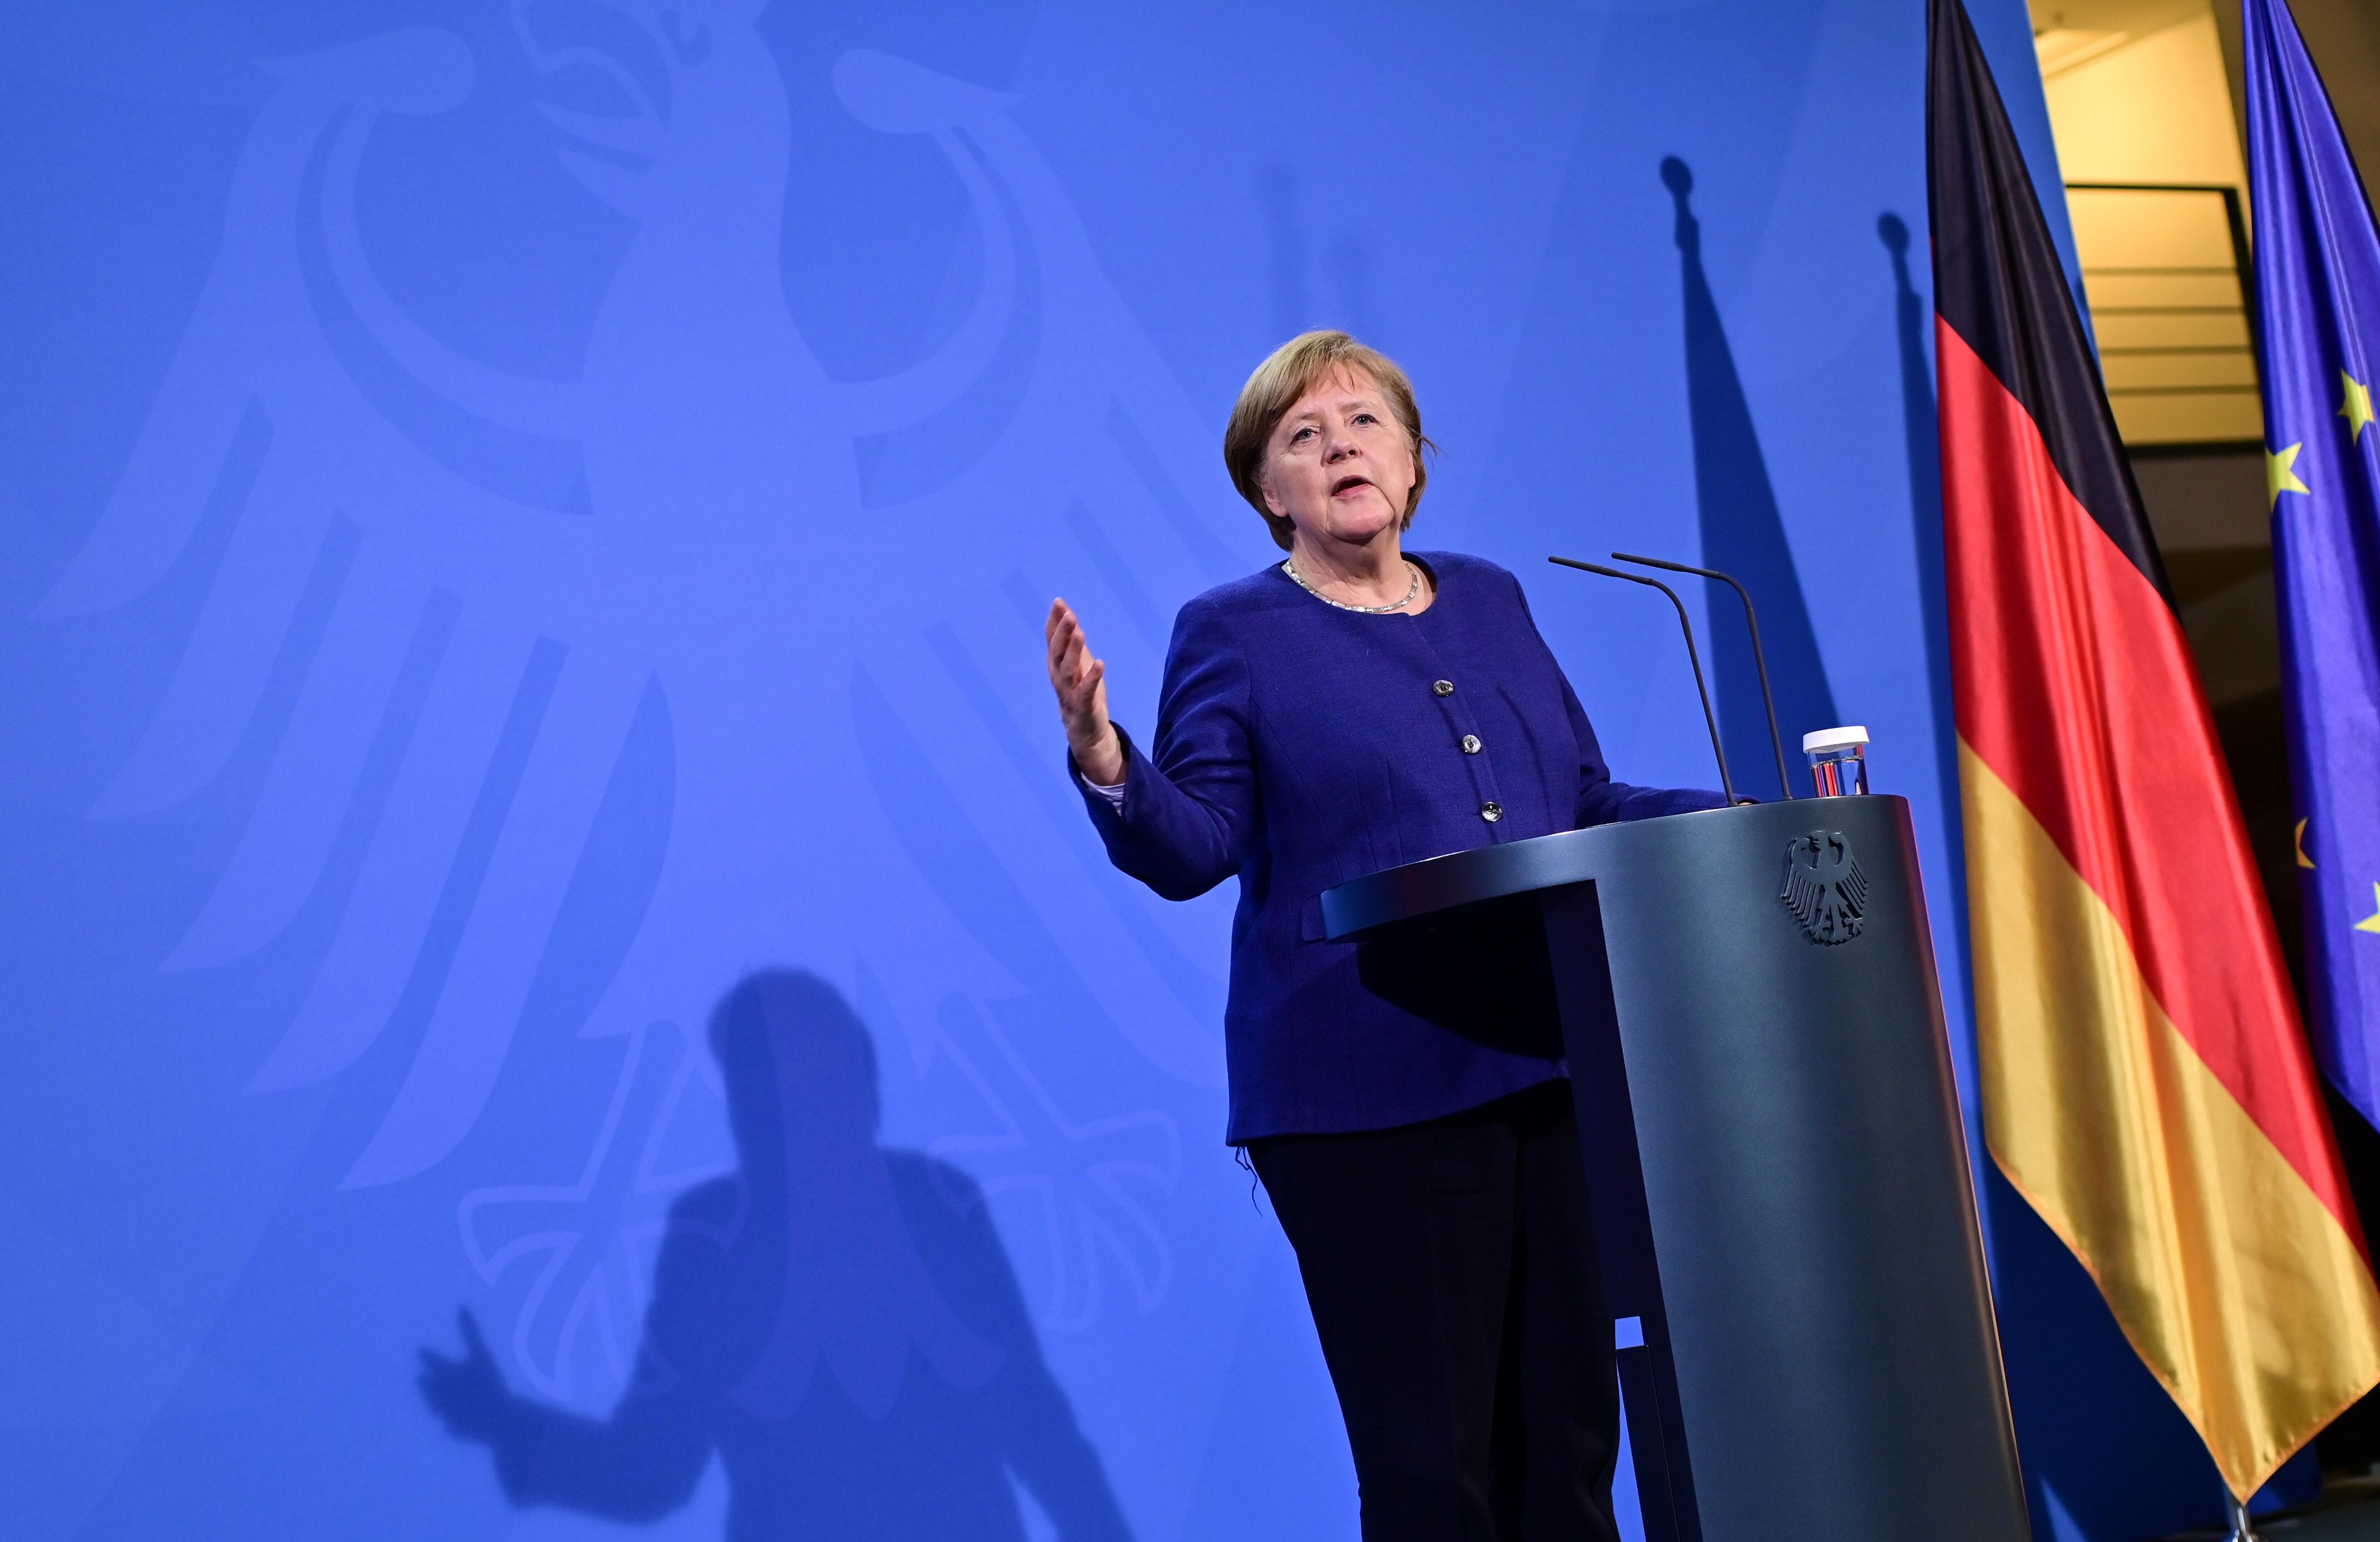 German Chancellor Angela Merkel addresses a press conference following the EU leaders' videoconference in Berlin, Germany February 25, 2021. John MacDougall/Pool via REUTERS